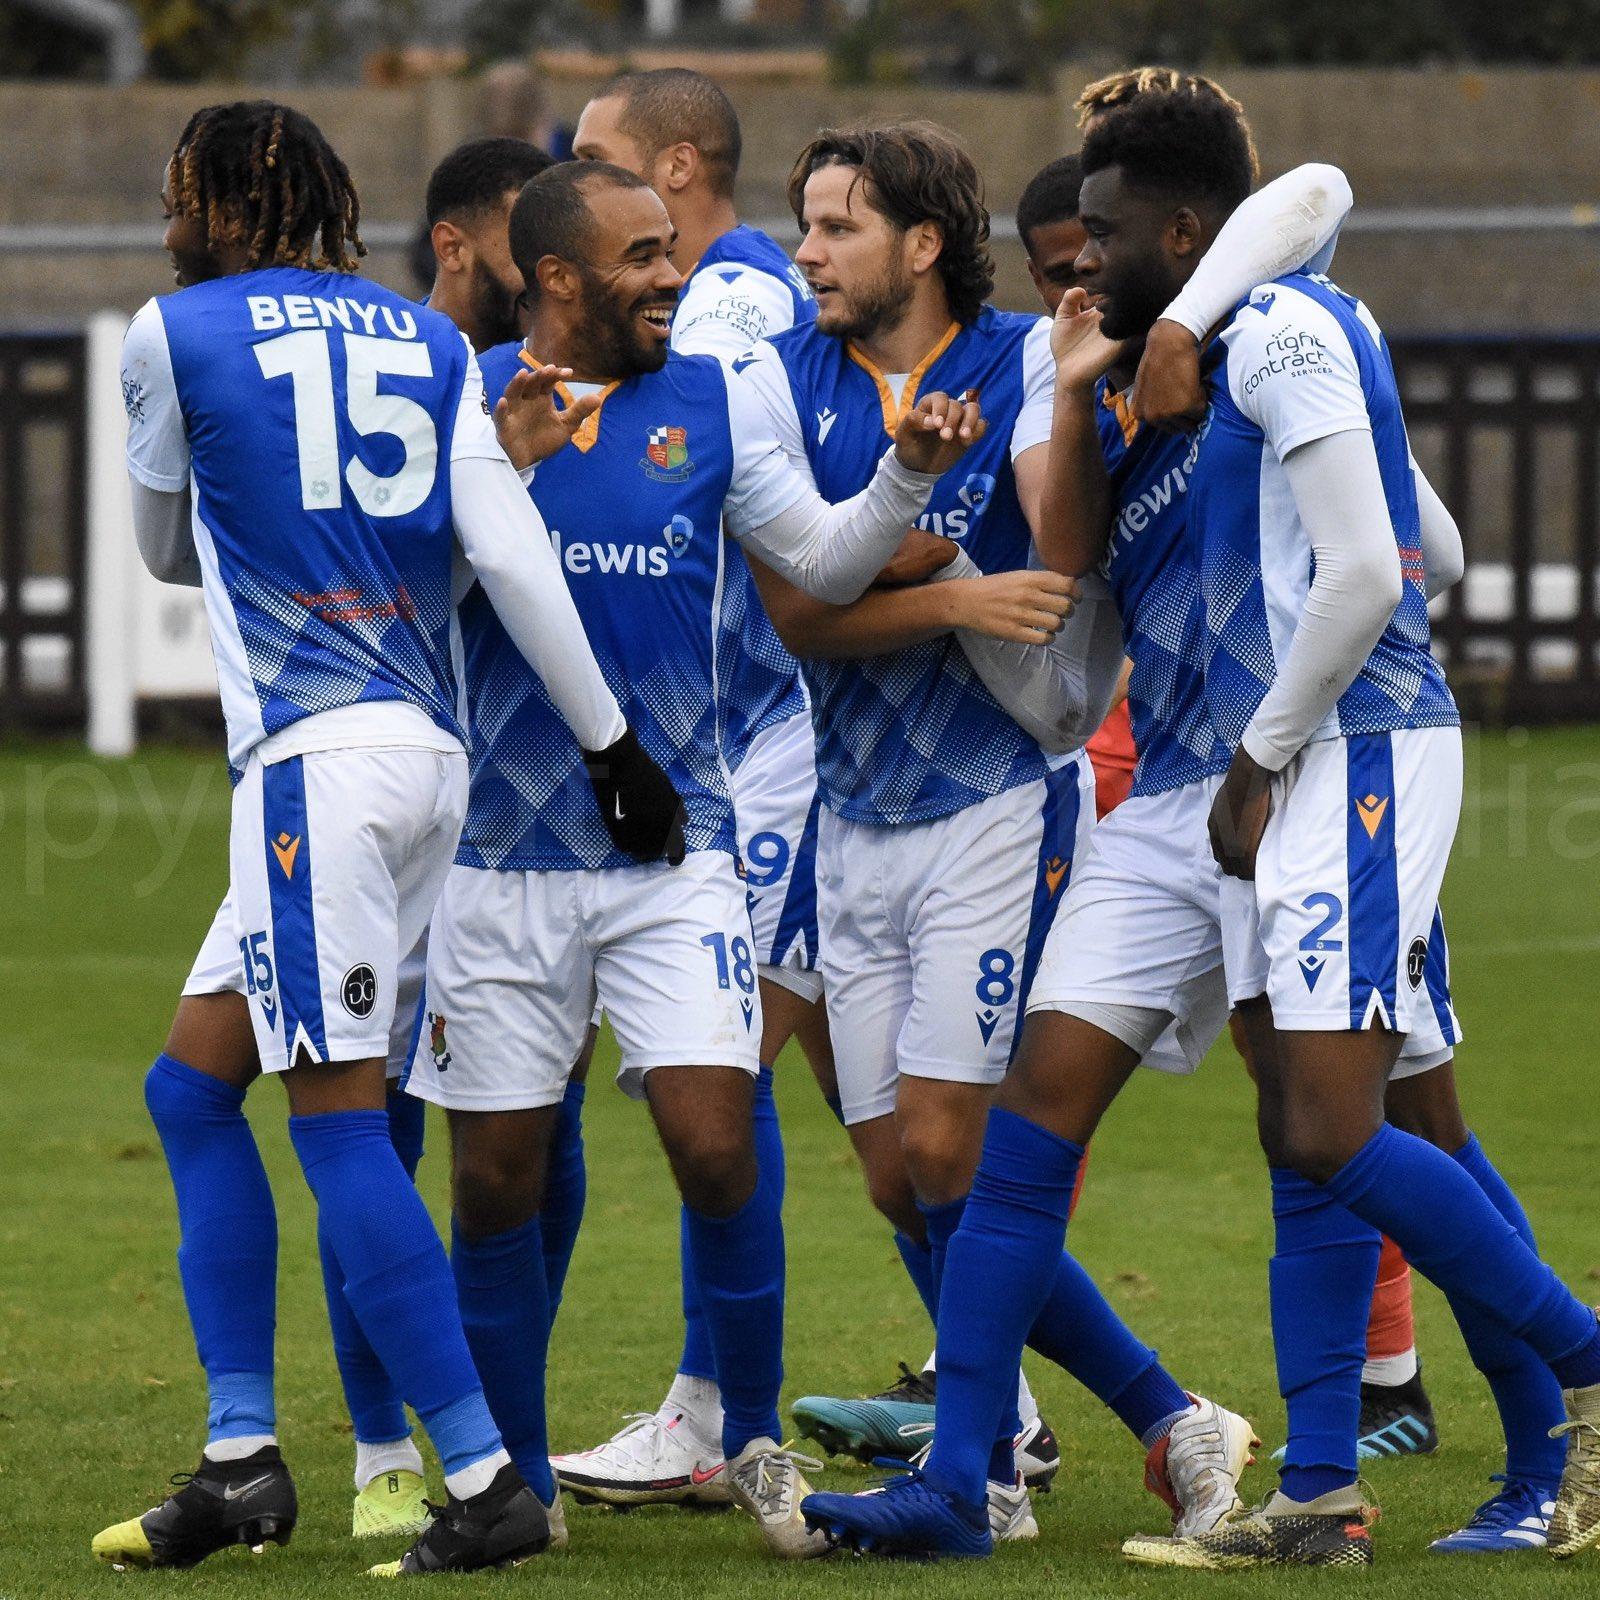 4 -3 win against Wrexham match report